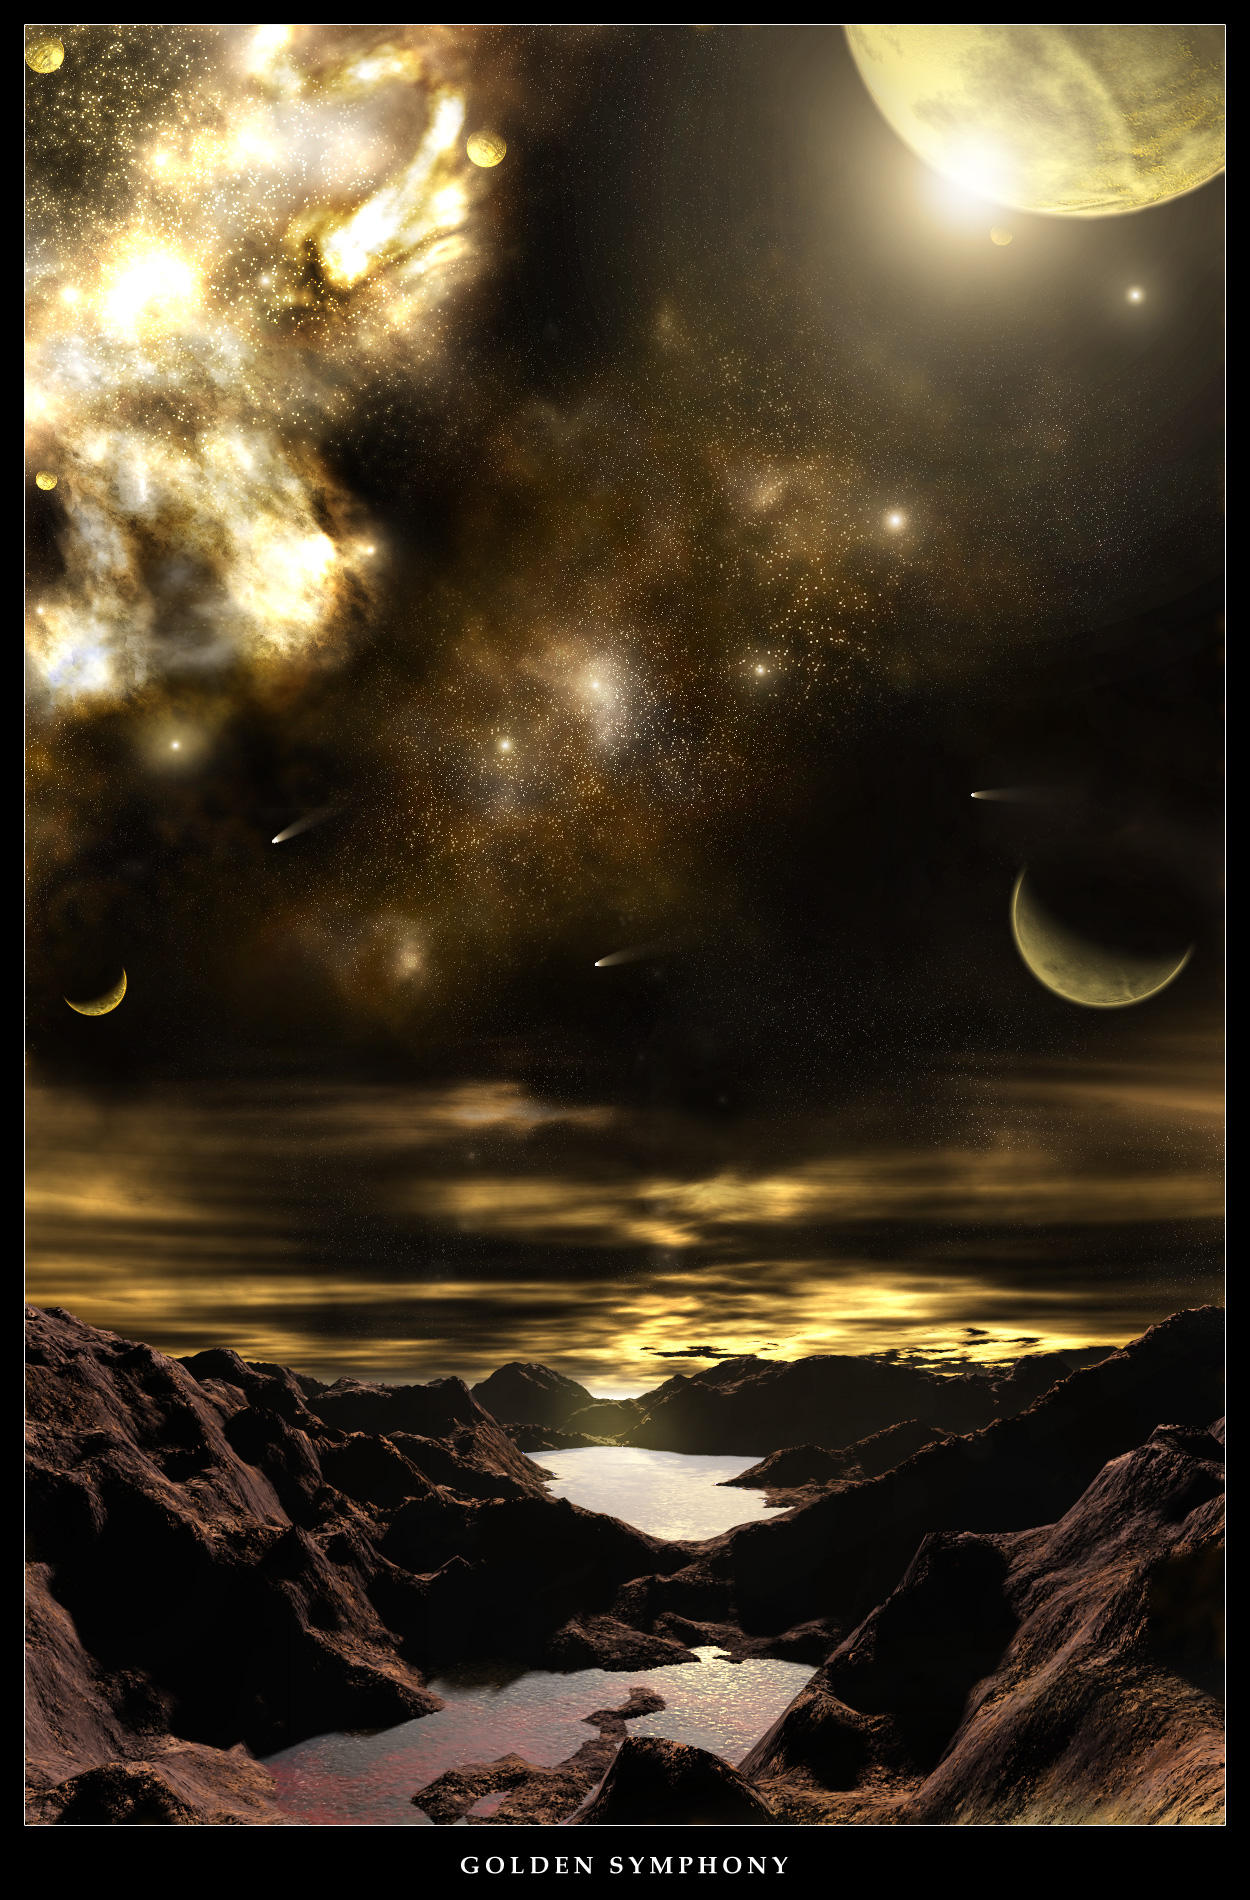 Golden Symphony by alyn